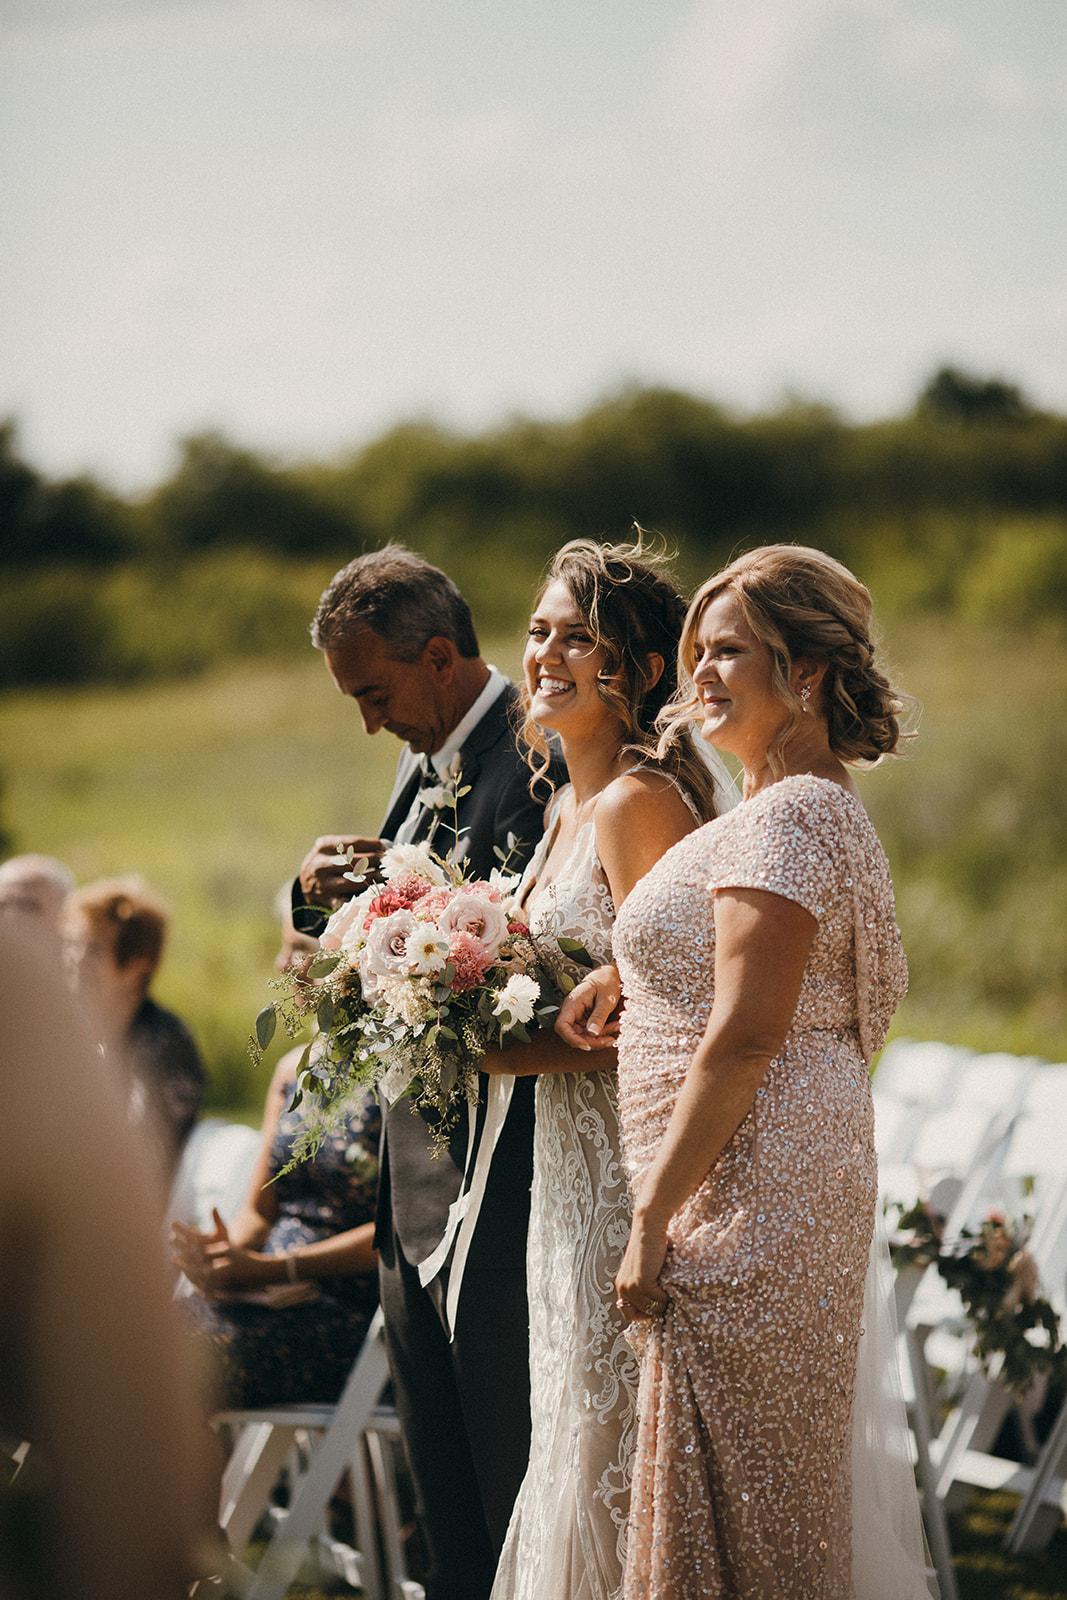 kaden_justine_wedding_3542.jpg